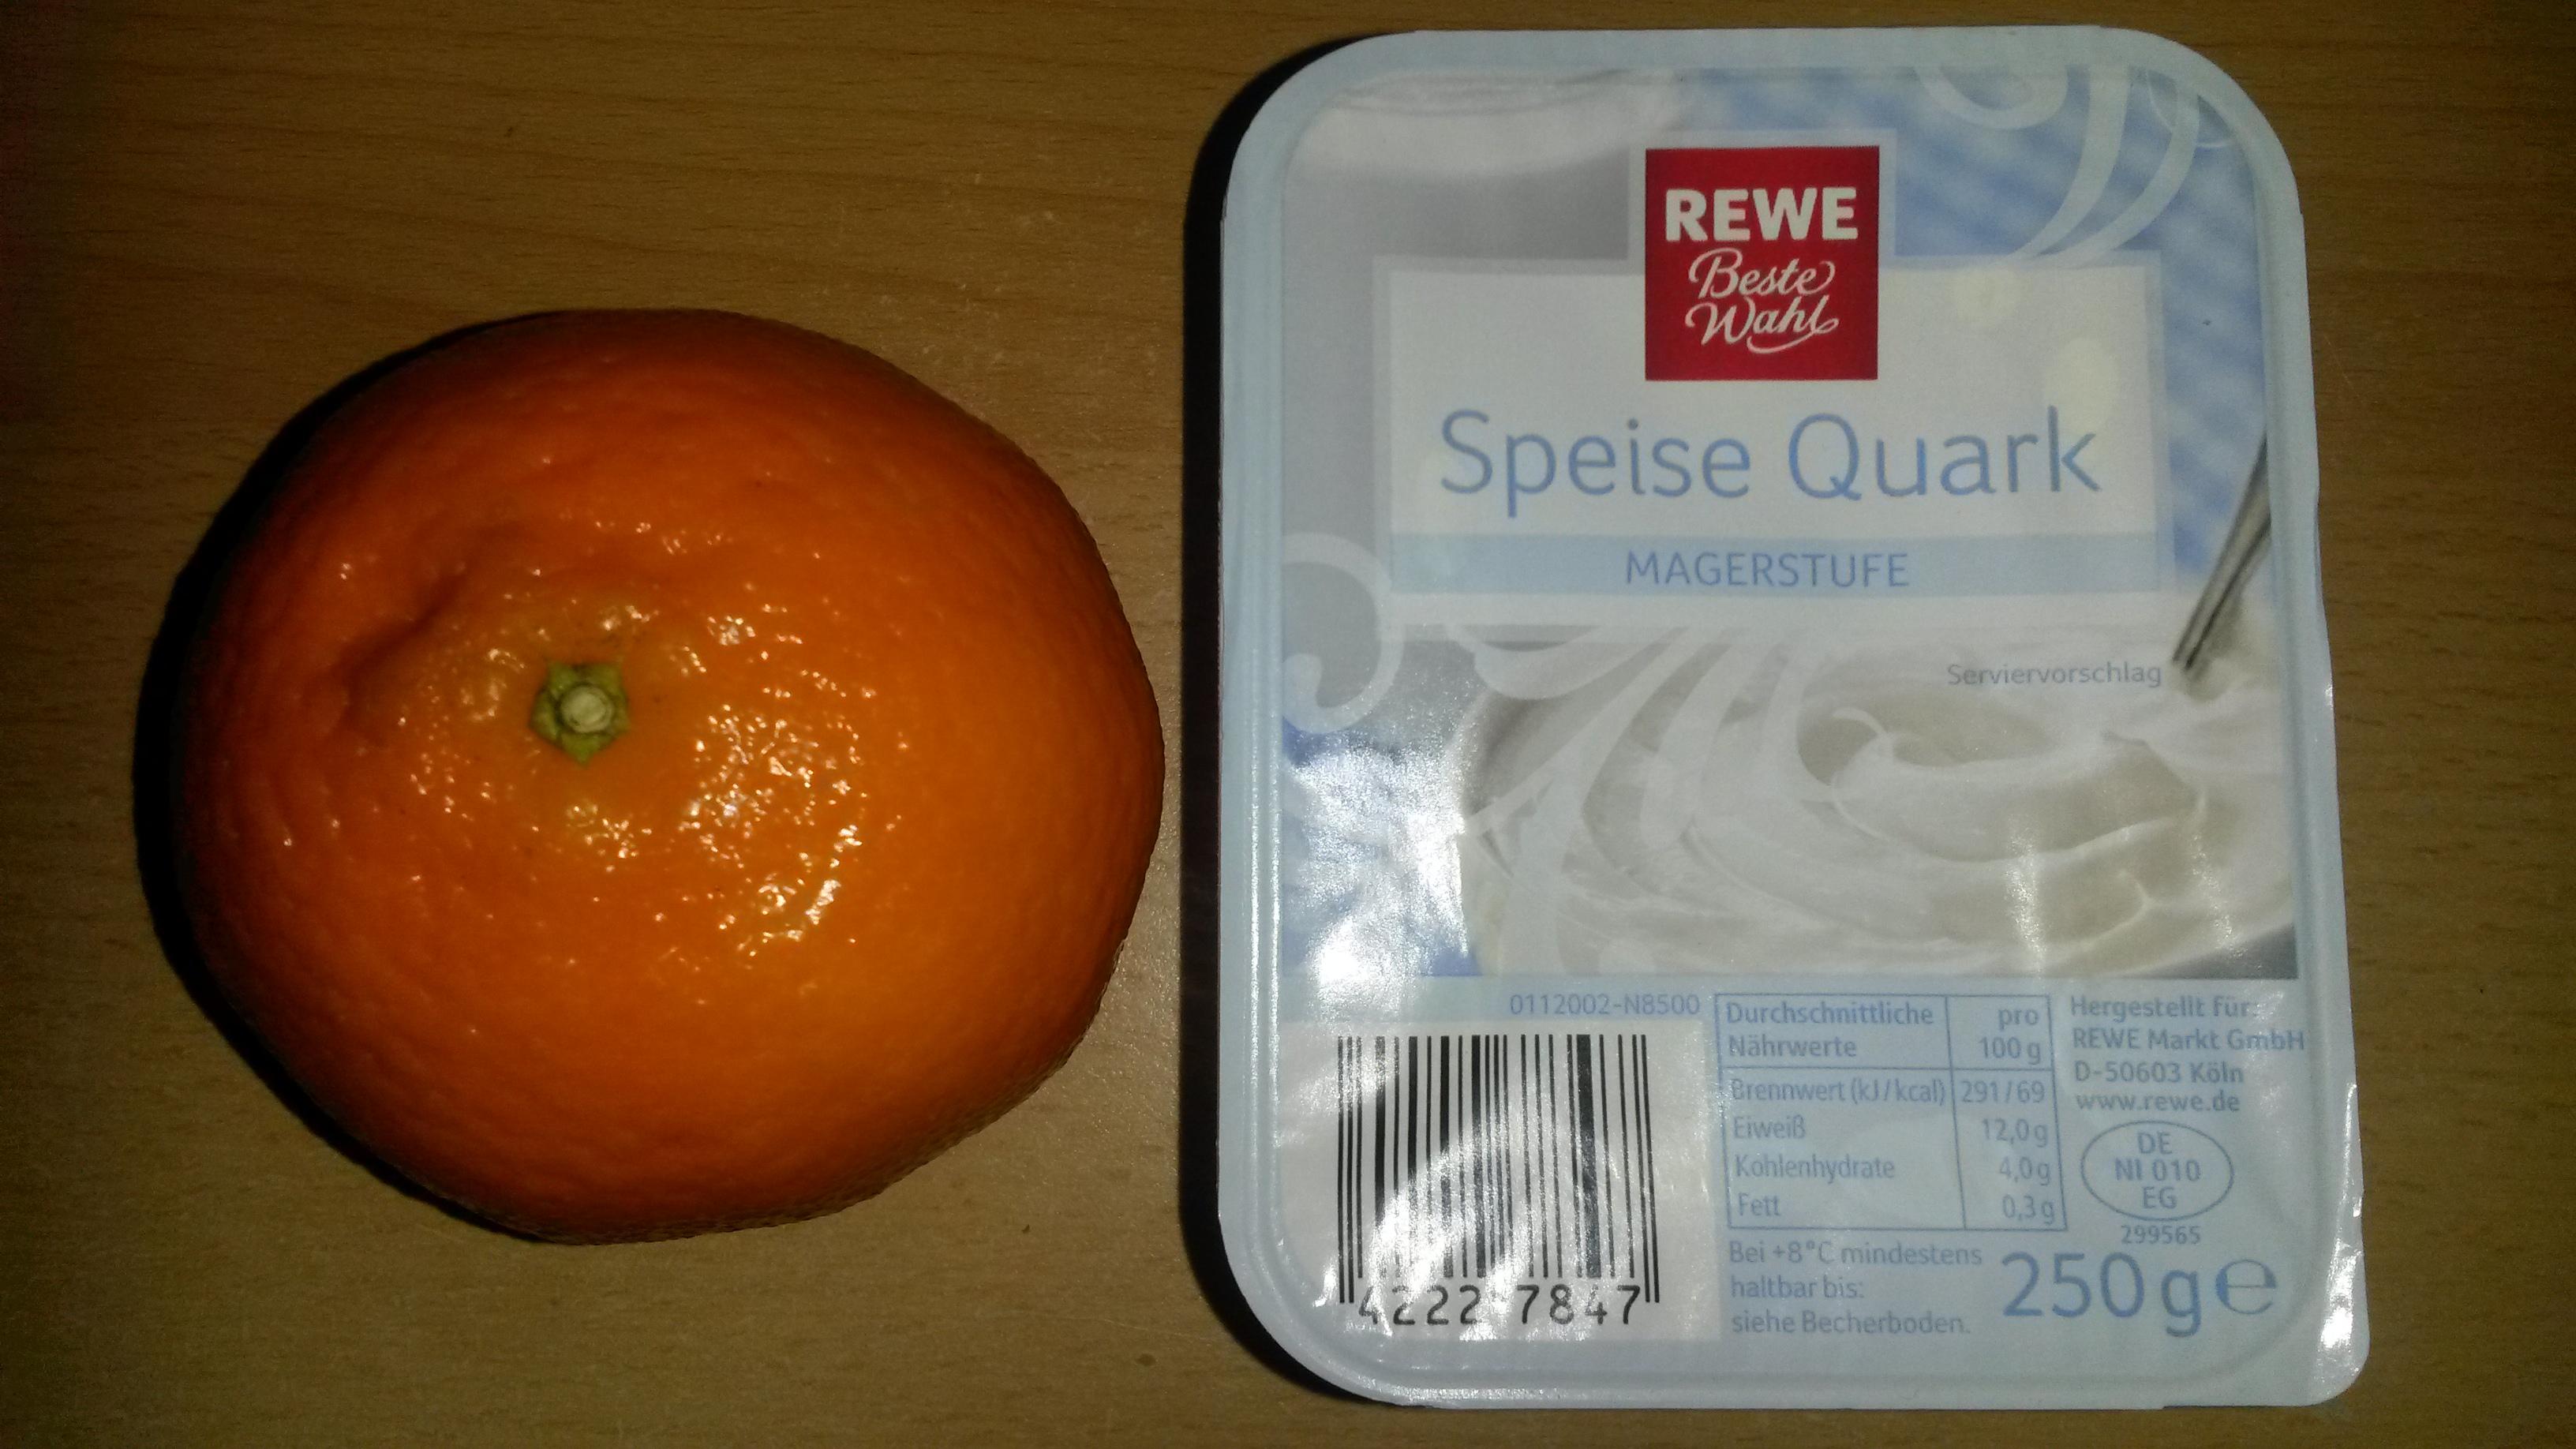 https://foodloader.net/sk0r_2014-01-28_Magerquark_und_Clementine.jpg